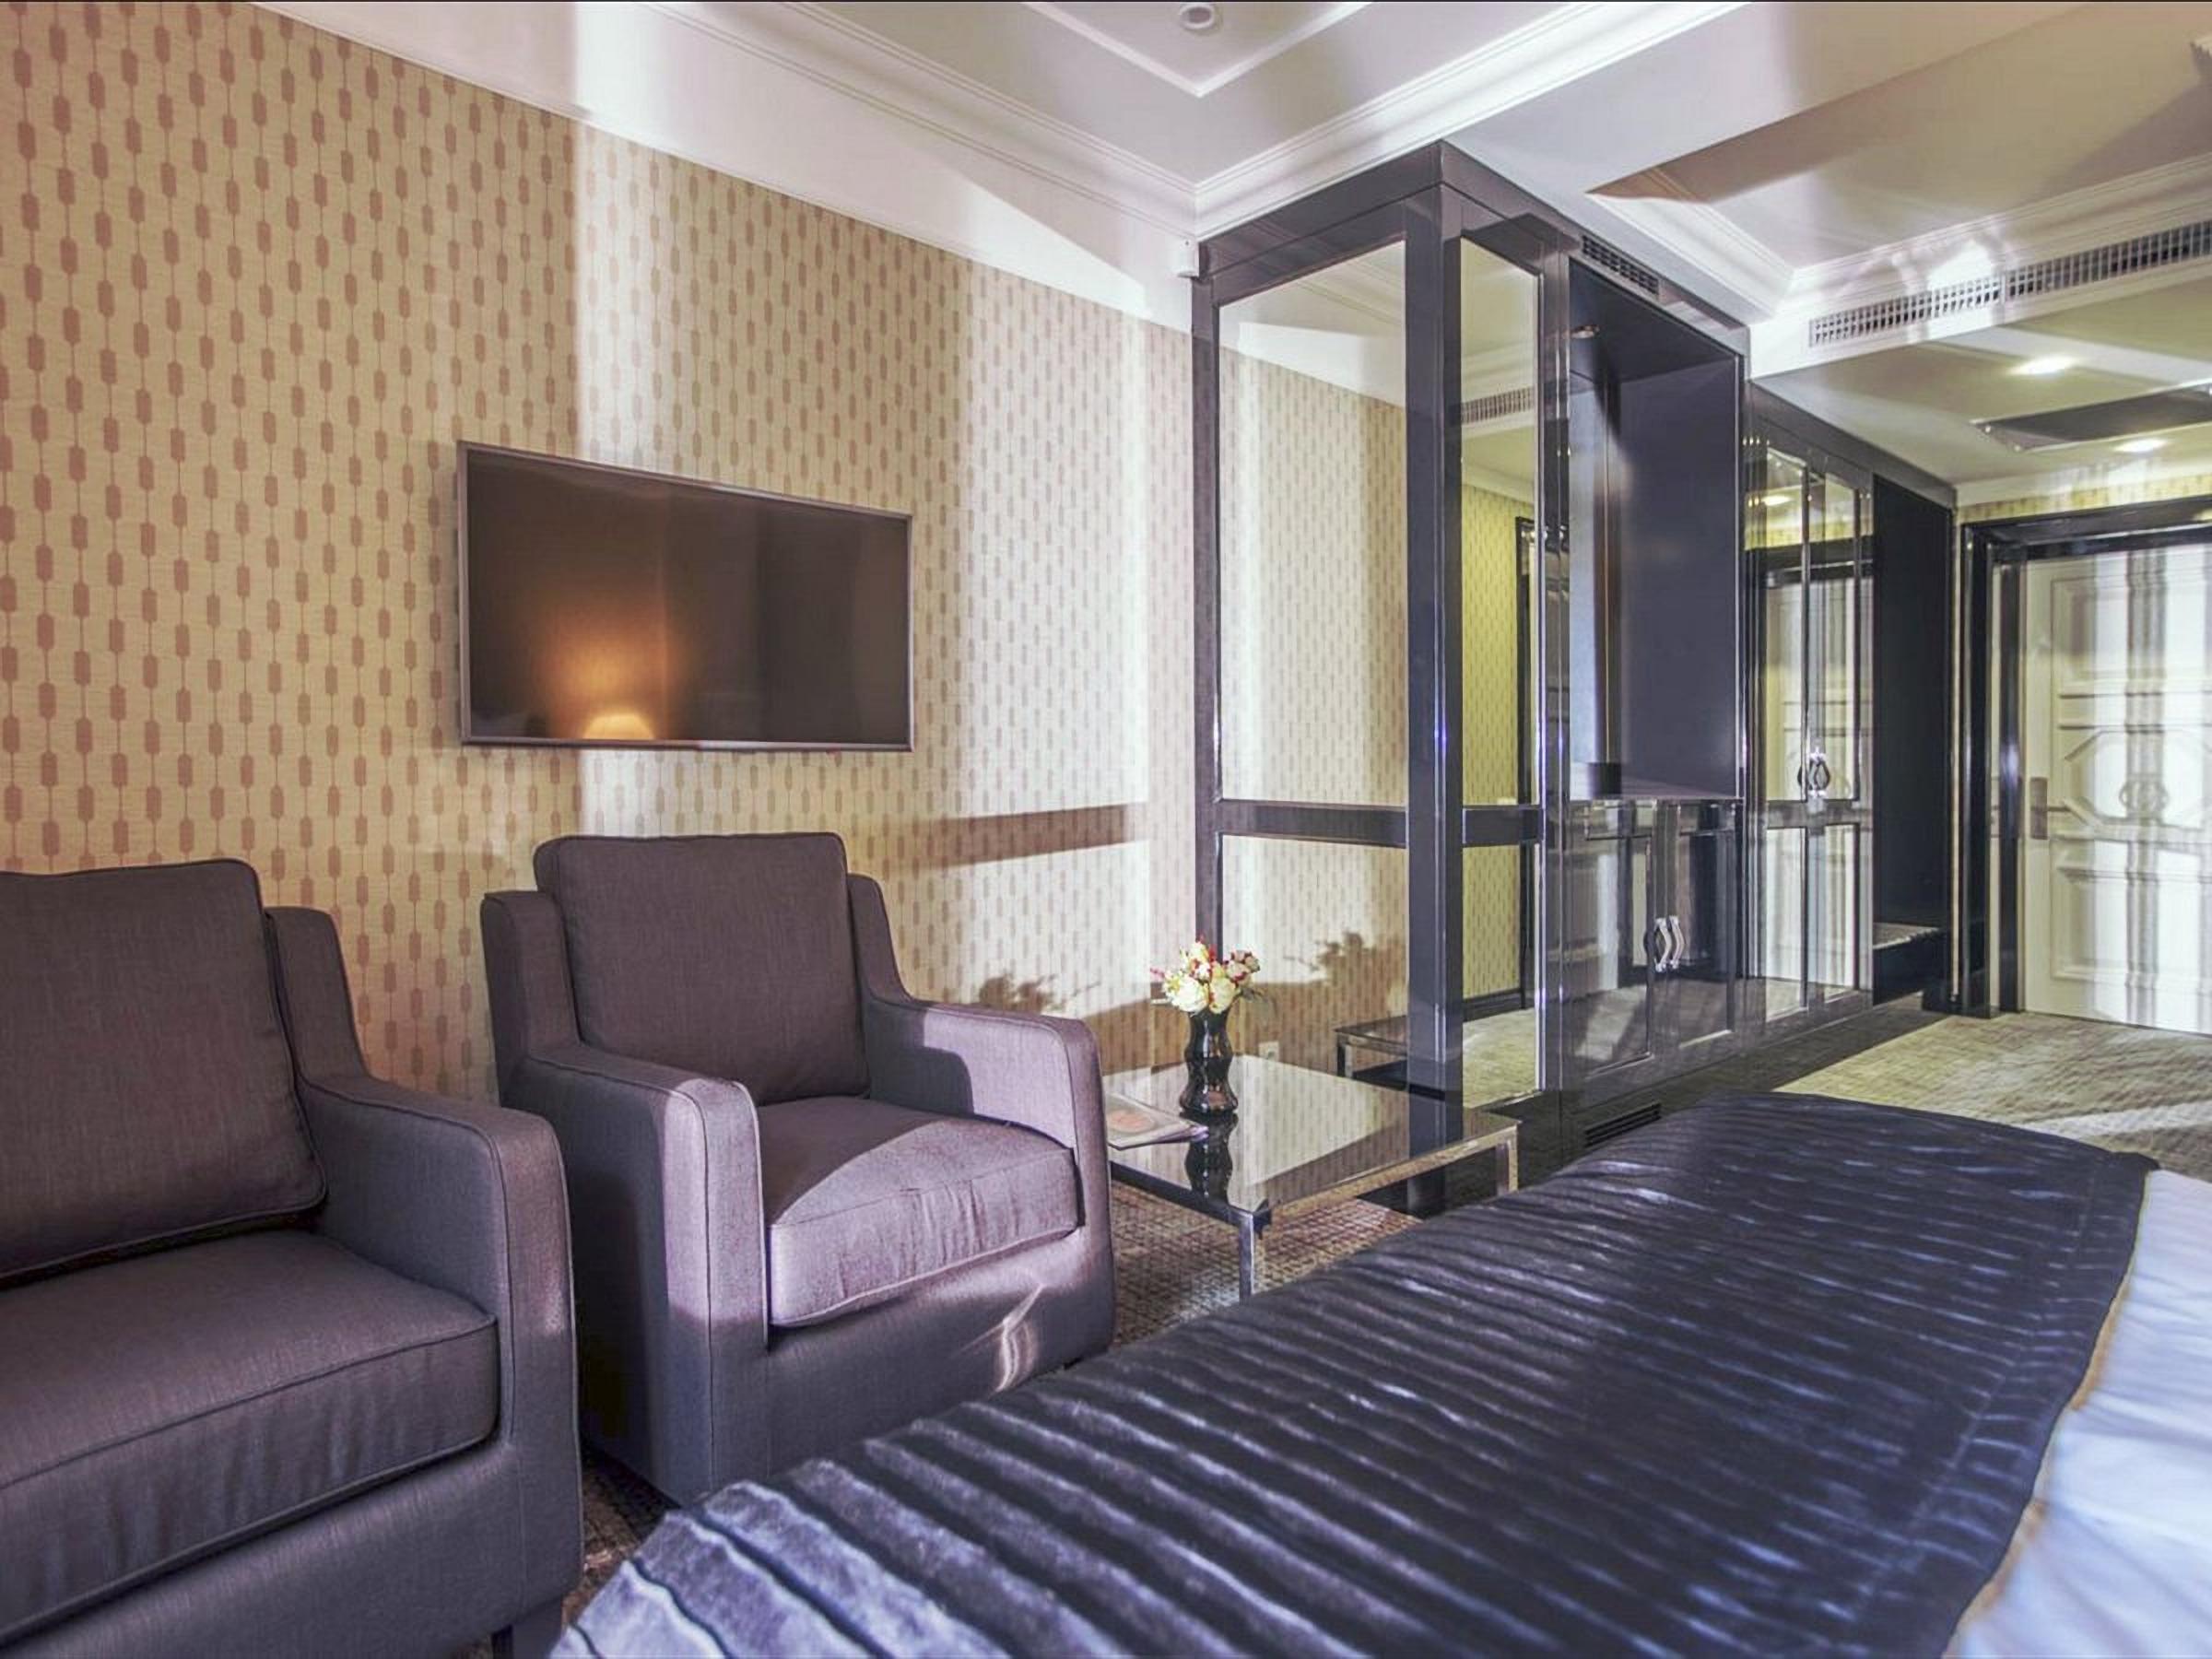 A modern room in the Wall Street Hotel Odessa Ukraine